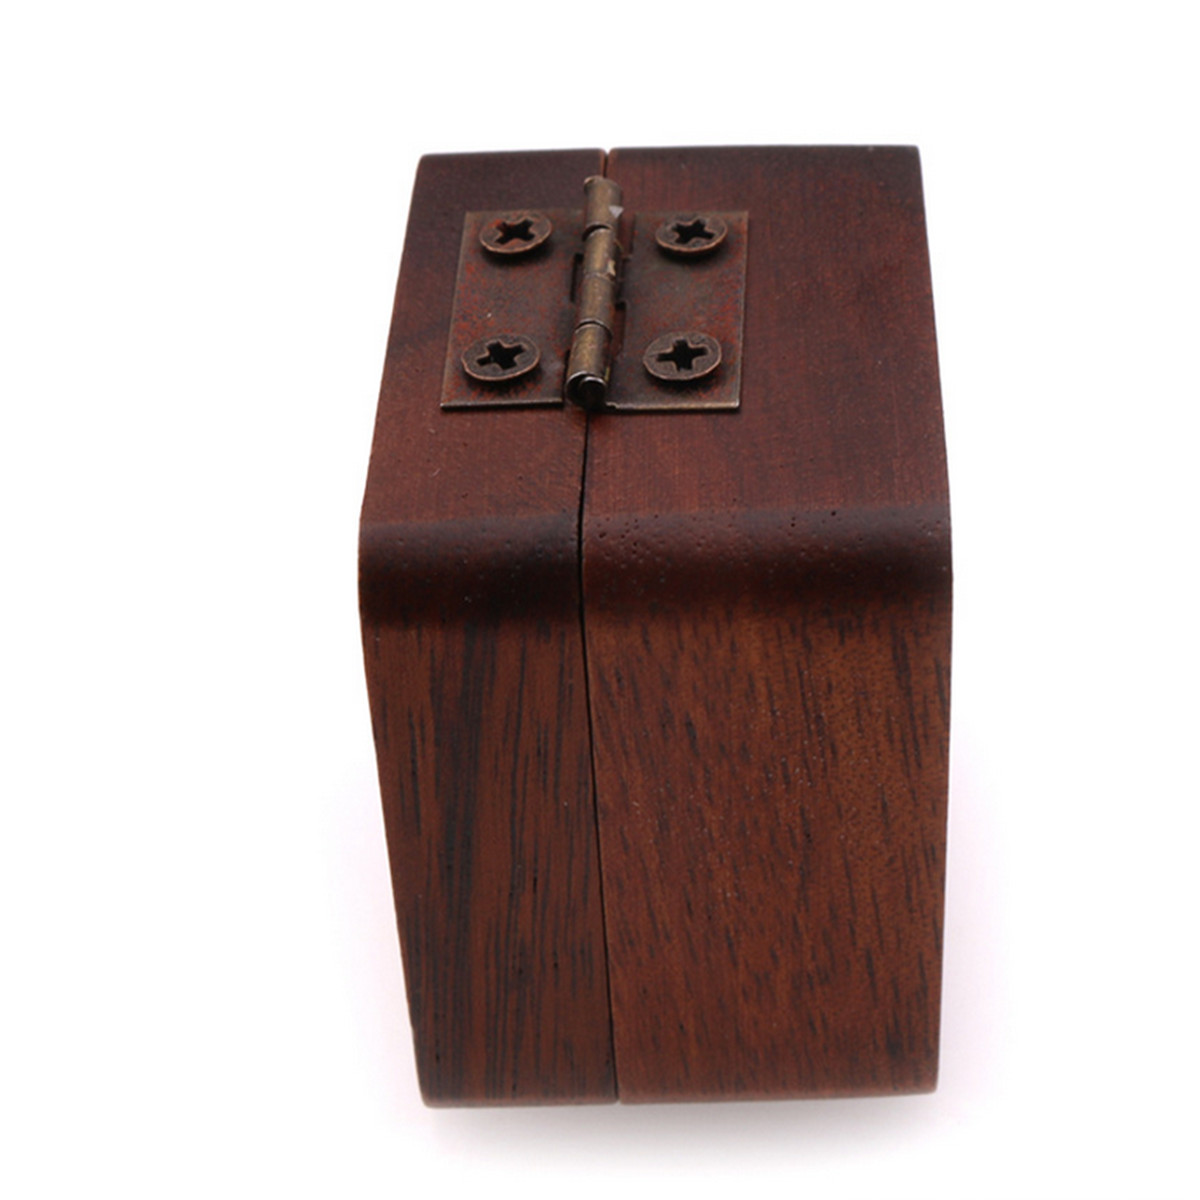 walnut wooden guitar pick box plectrum holder case guitar lover musical box gift ebay. Black Bedroom Furniture Sets. Home Design Ideas